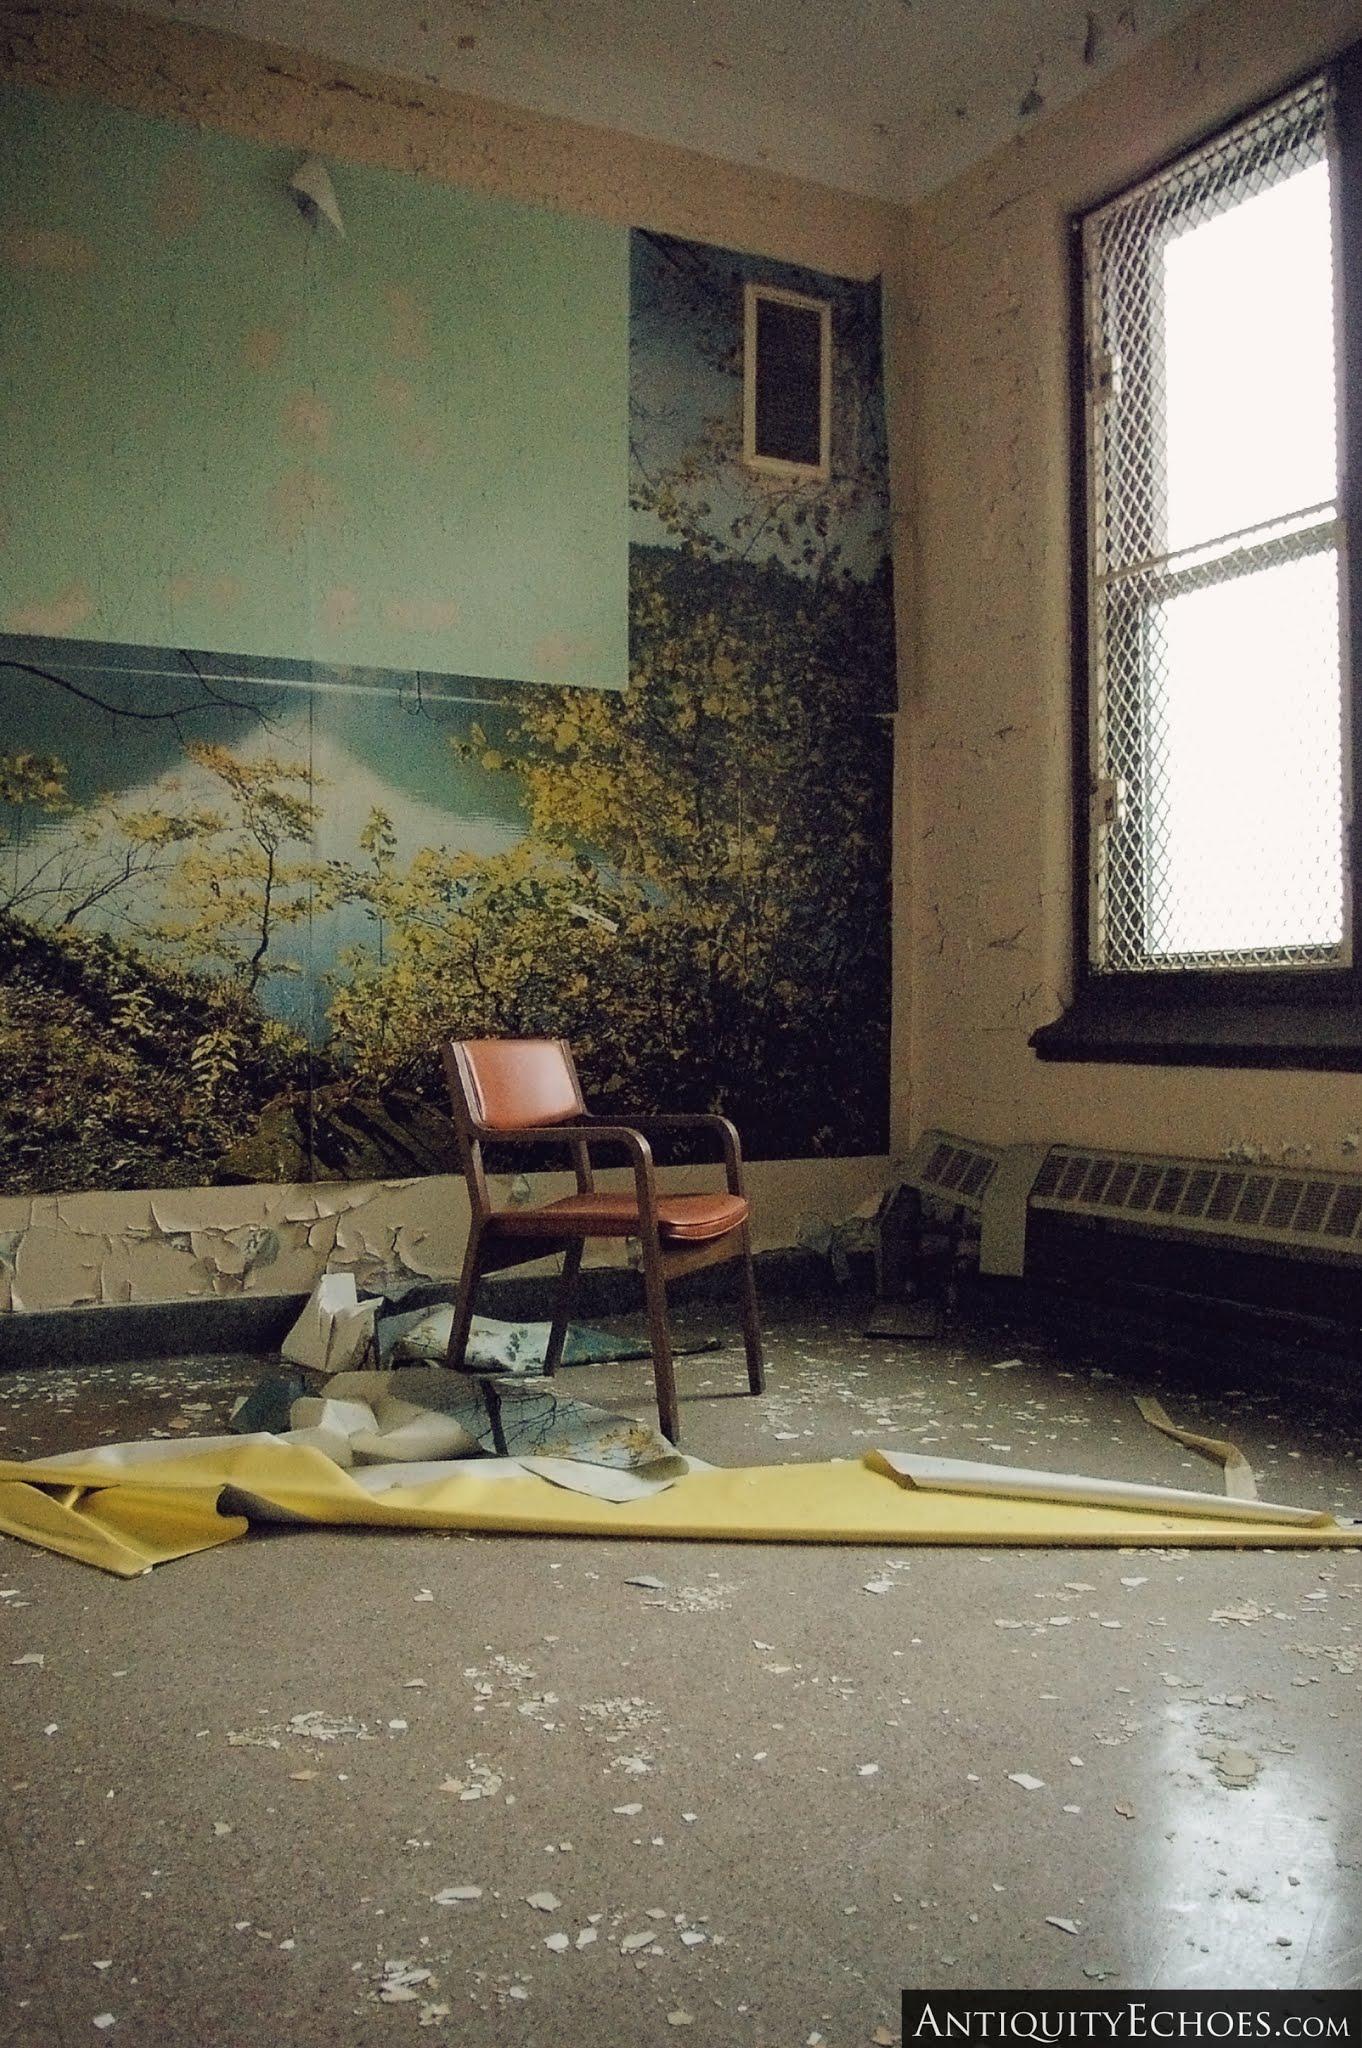 Overbrook Asylum - Wonder